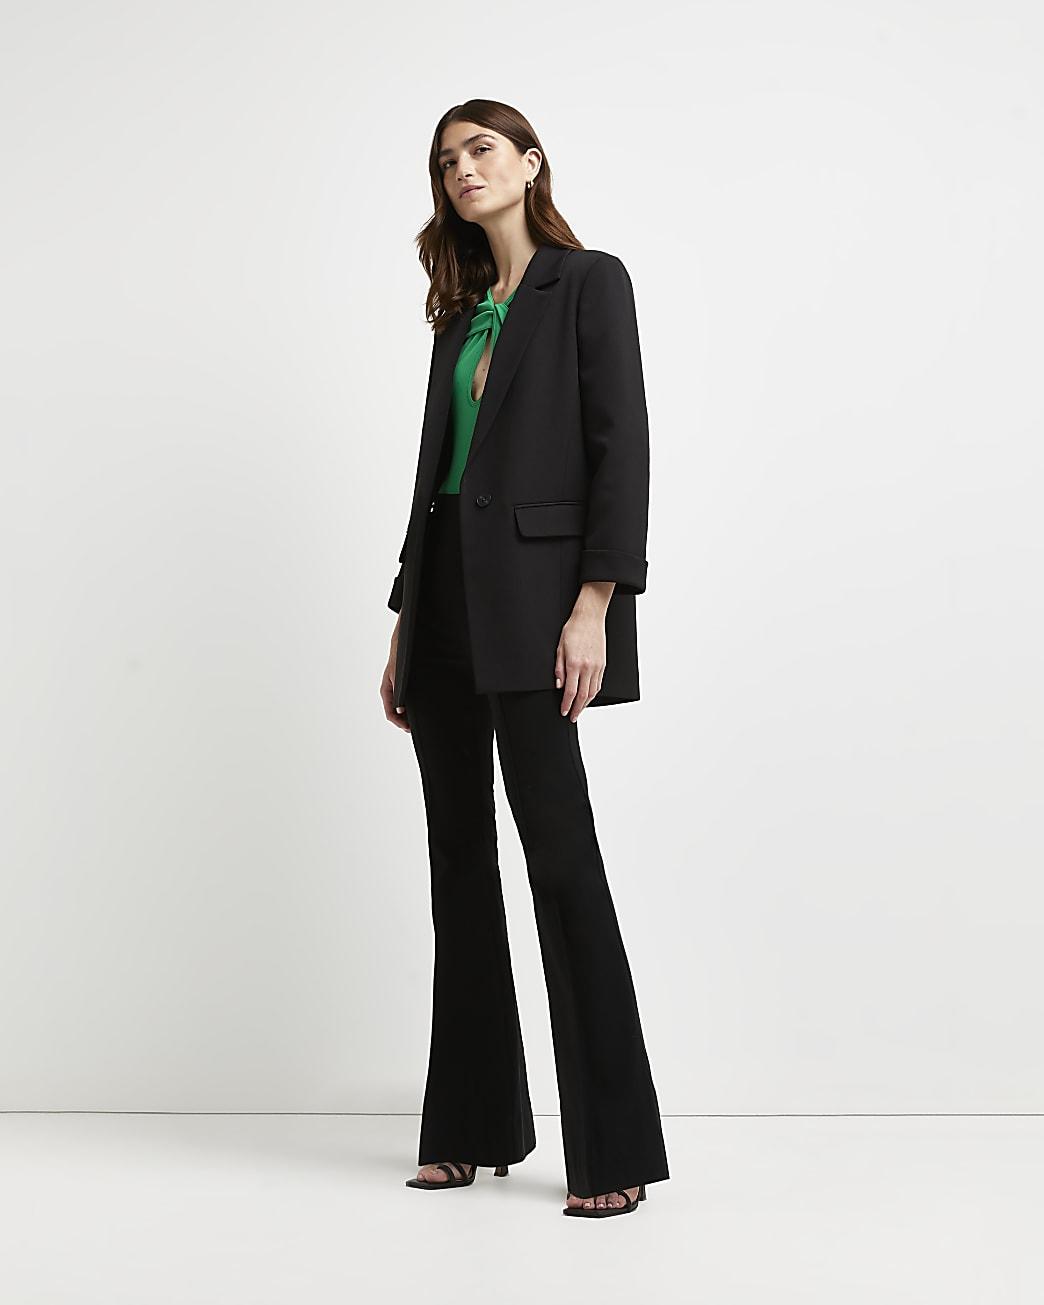 Black oversized blazer